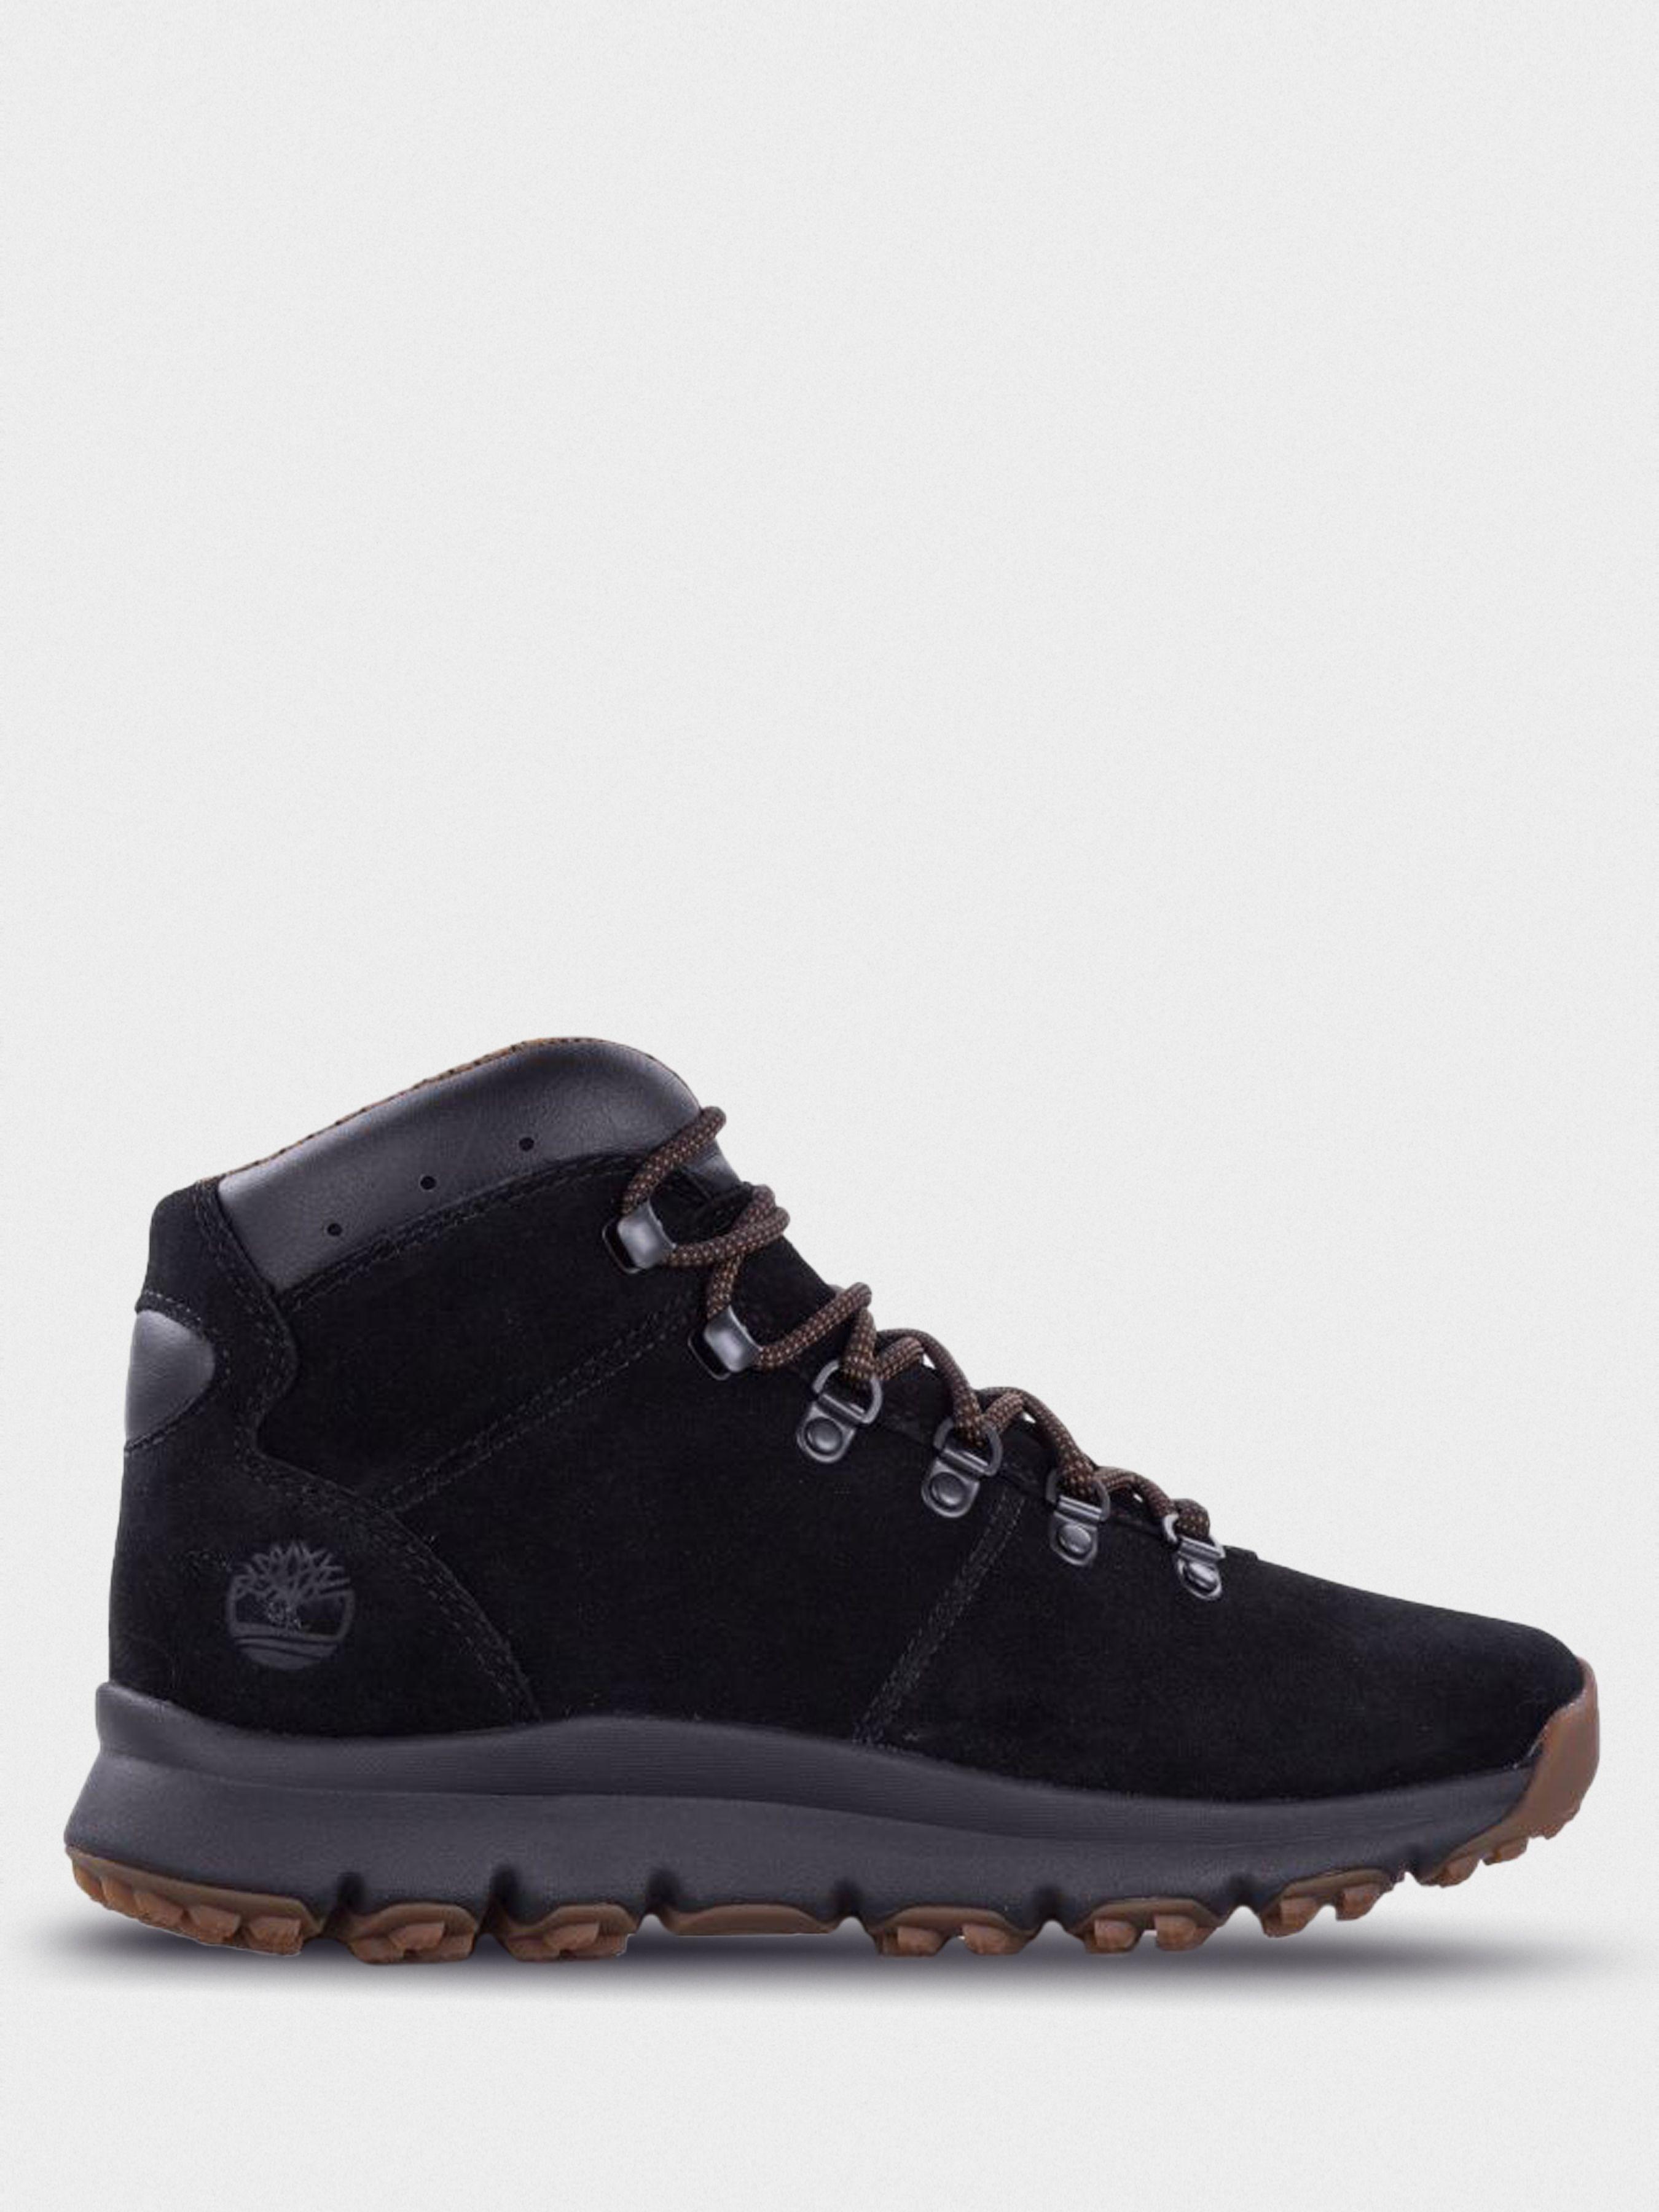 Купить Ботинки мужские Timberland World Hiker TF3838, Черный